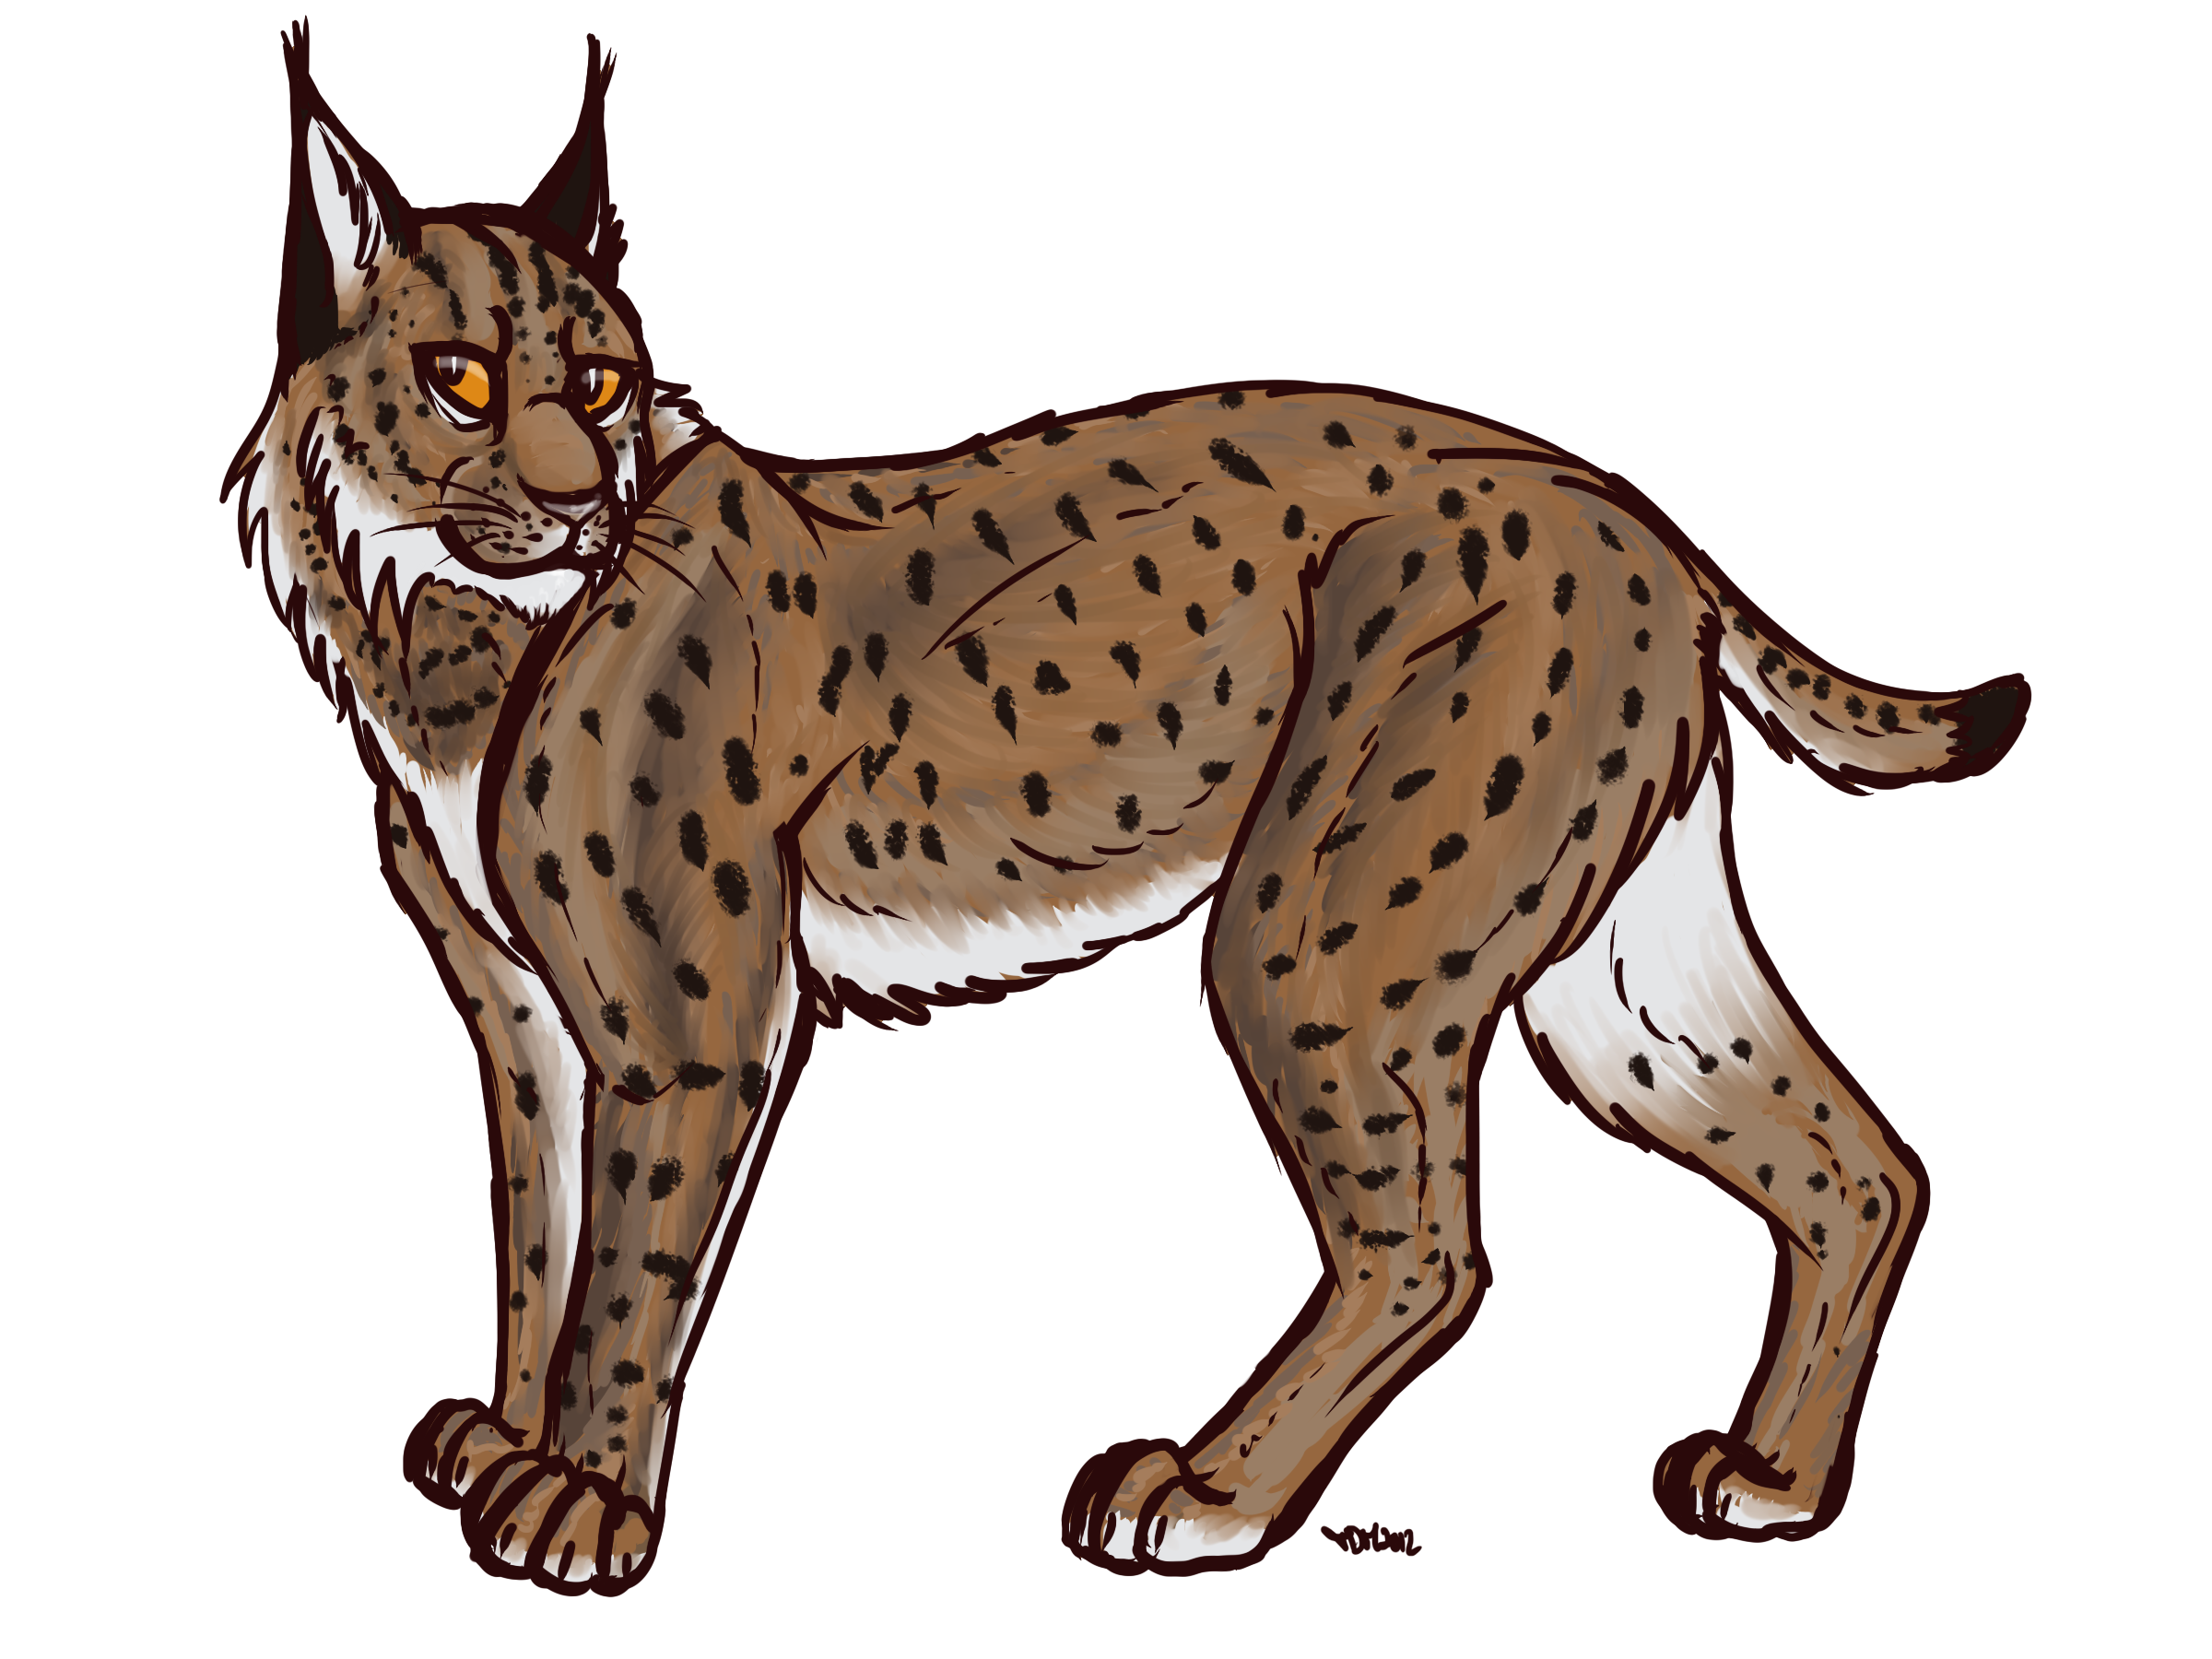 Eurasian drawing clip art. Bobcat clipart canada lynx